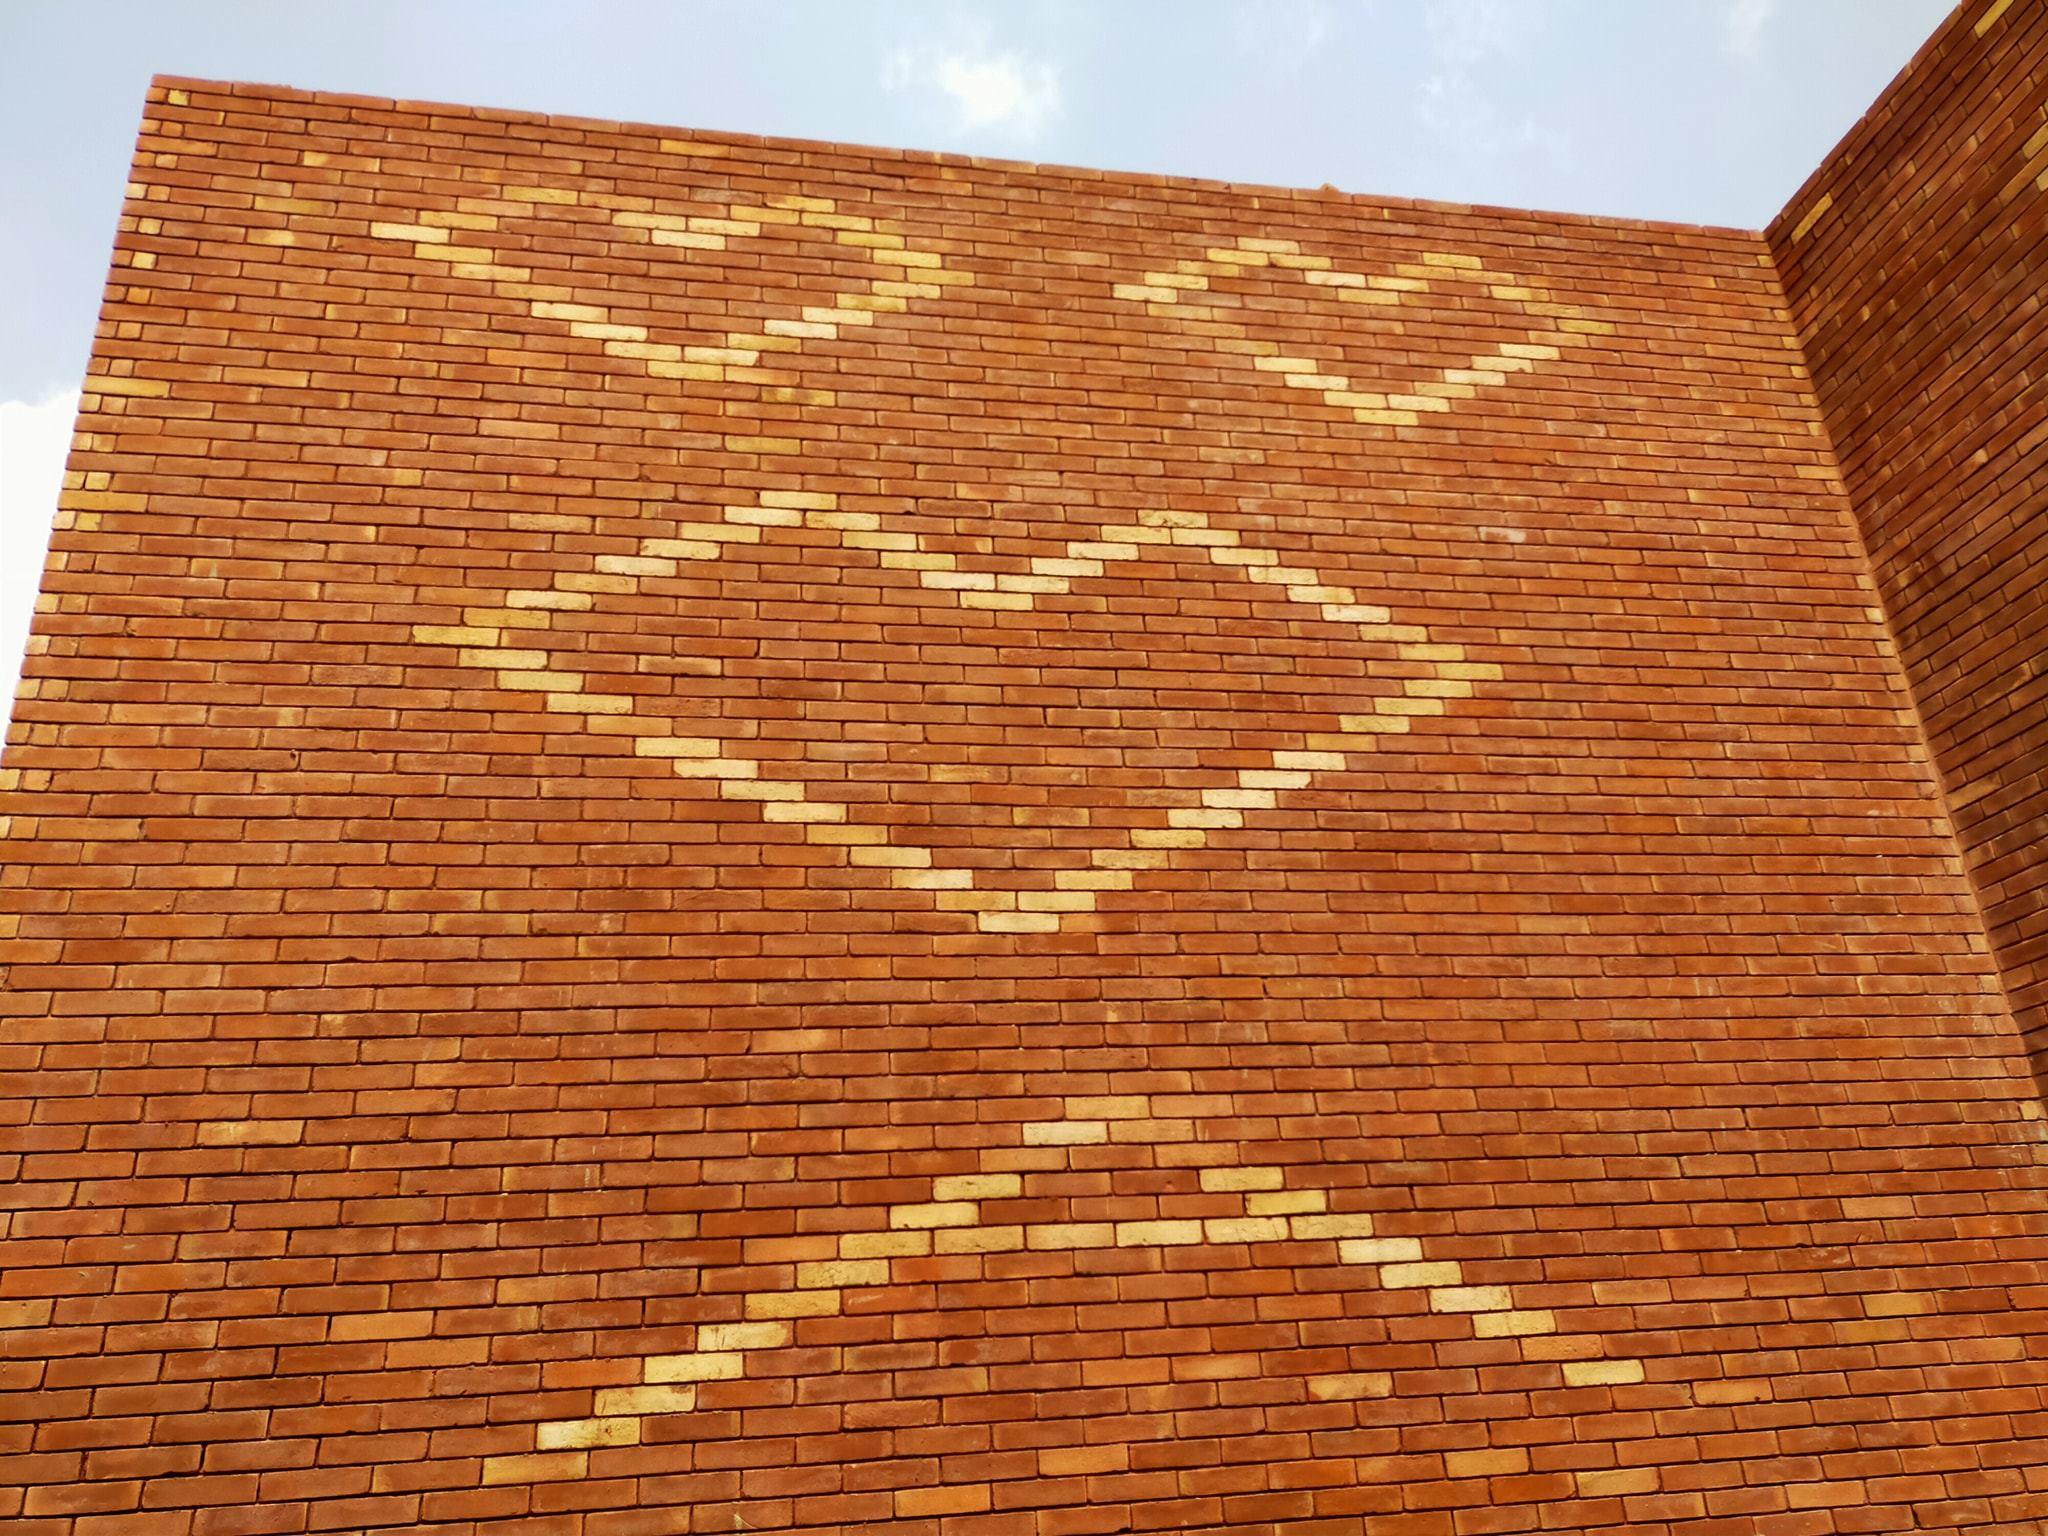 5 Lahori gutka bricks wall tiles faisalabad